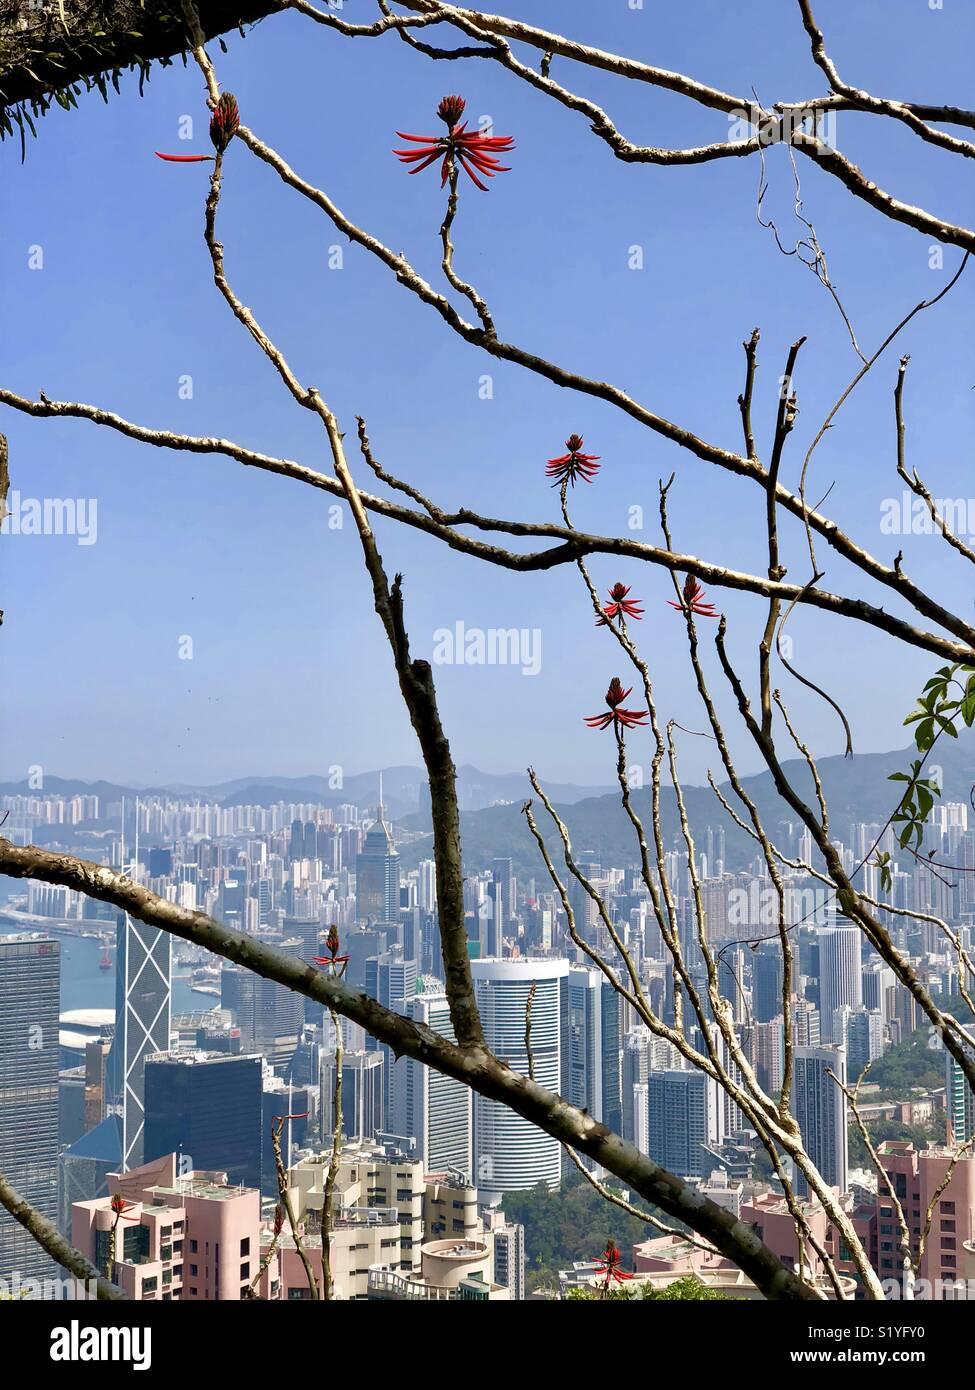 Hong Kong seen through blossoms and branches - Stock Image